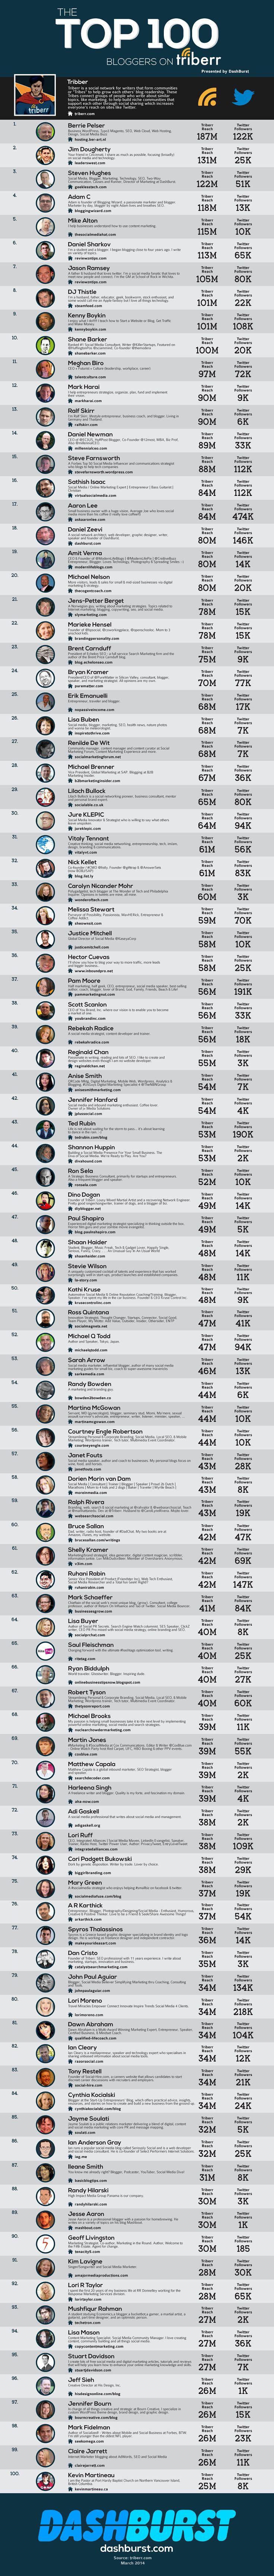 100 Top #Bloggers To Follow On #Triberr 2014 - #infographic #blogging #socialmedia